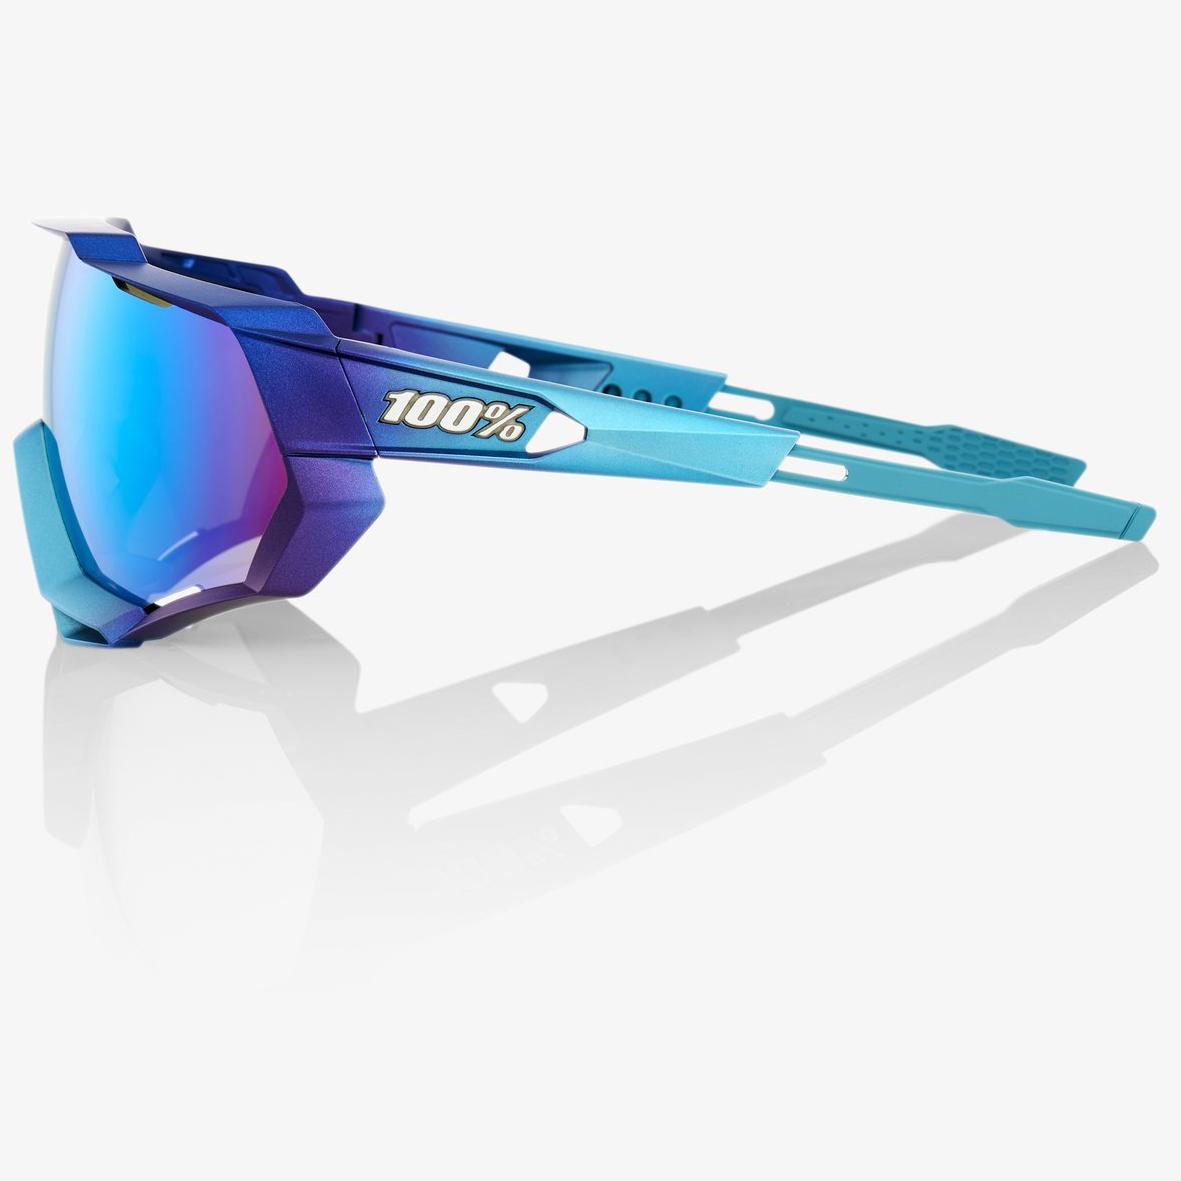 Imagen de 100% Speedtrap Mirror Lens Glasses - Matte Metallic Into the Fade/Blue Topaz Multilayer + Clear